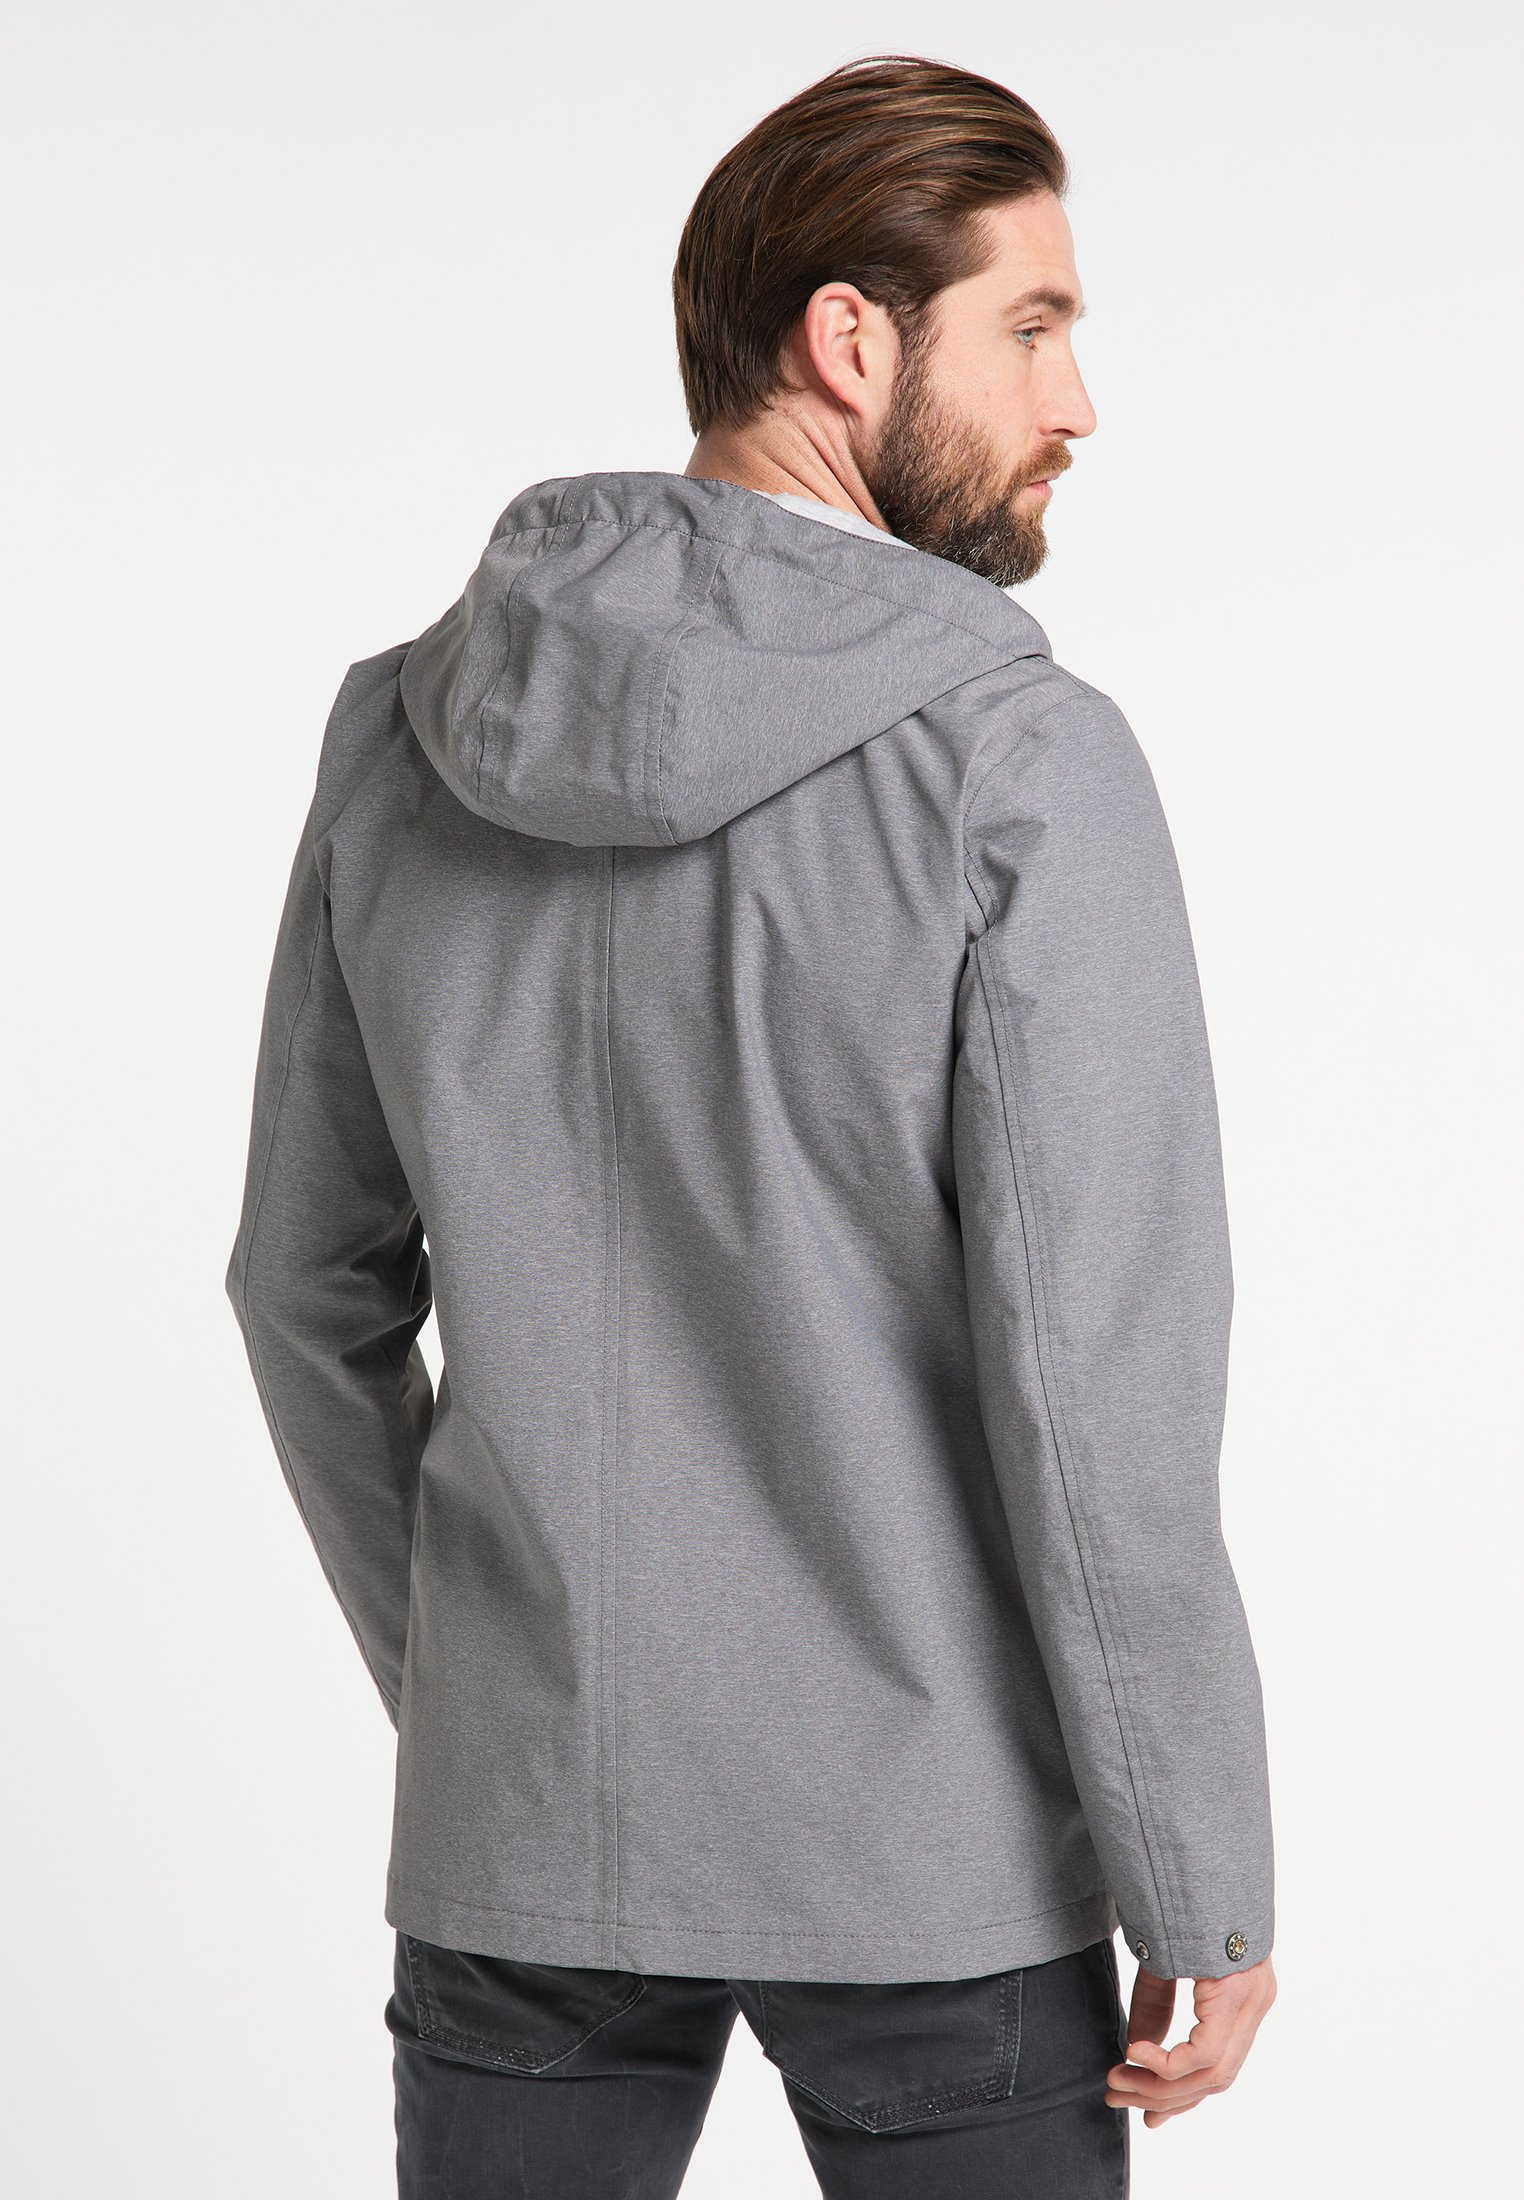 Schmuddelwedda Regenjacke / Wasserabweisende Jacke - Gray Melange